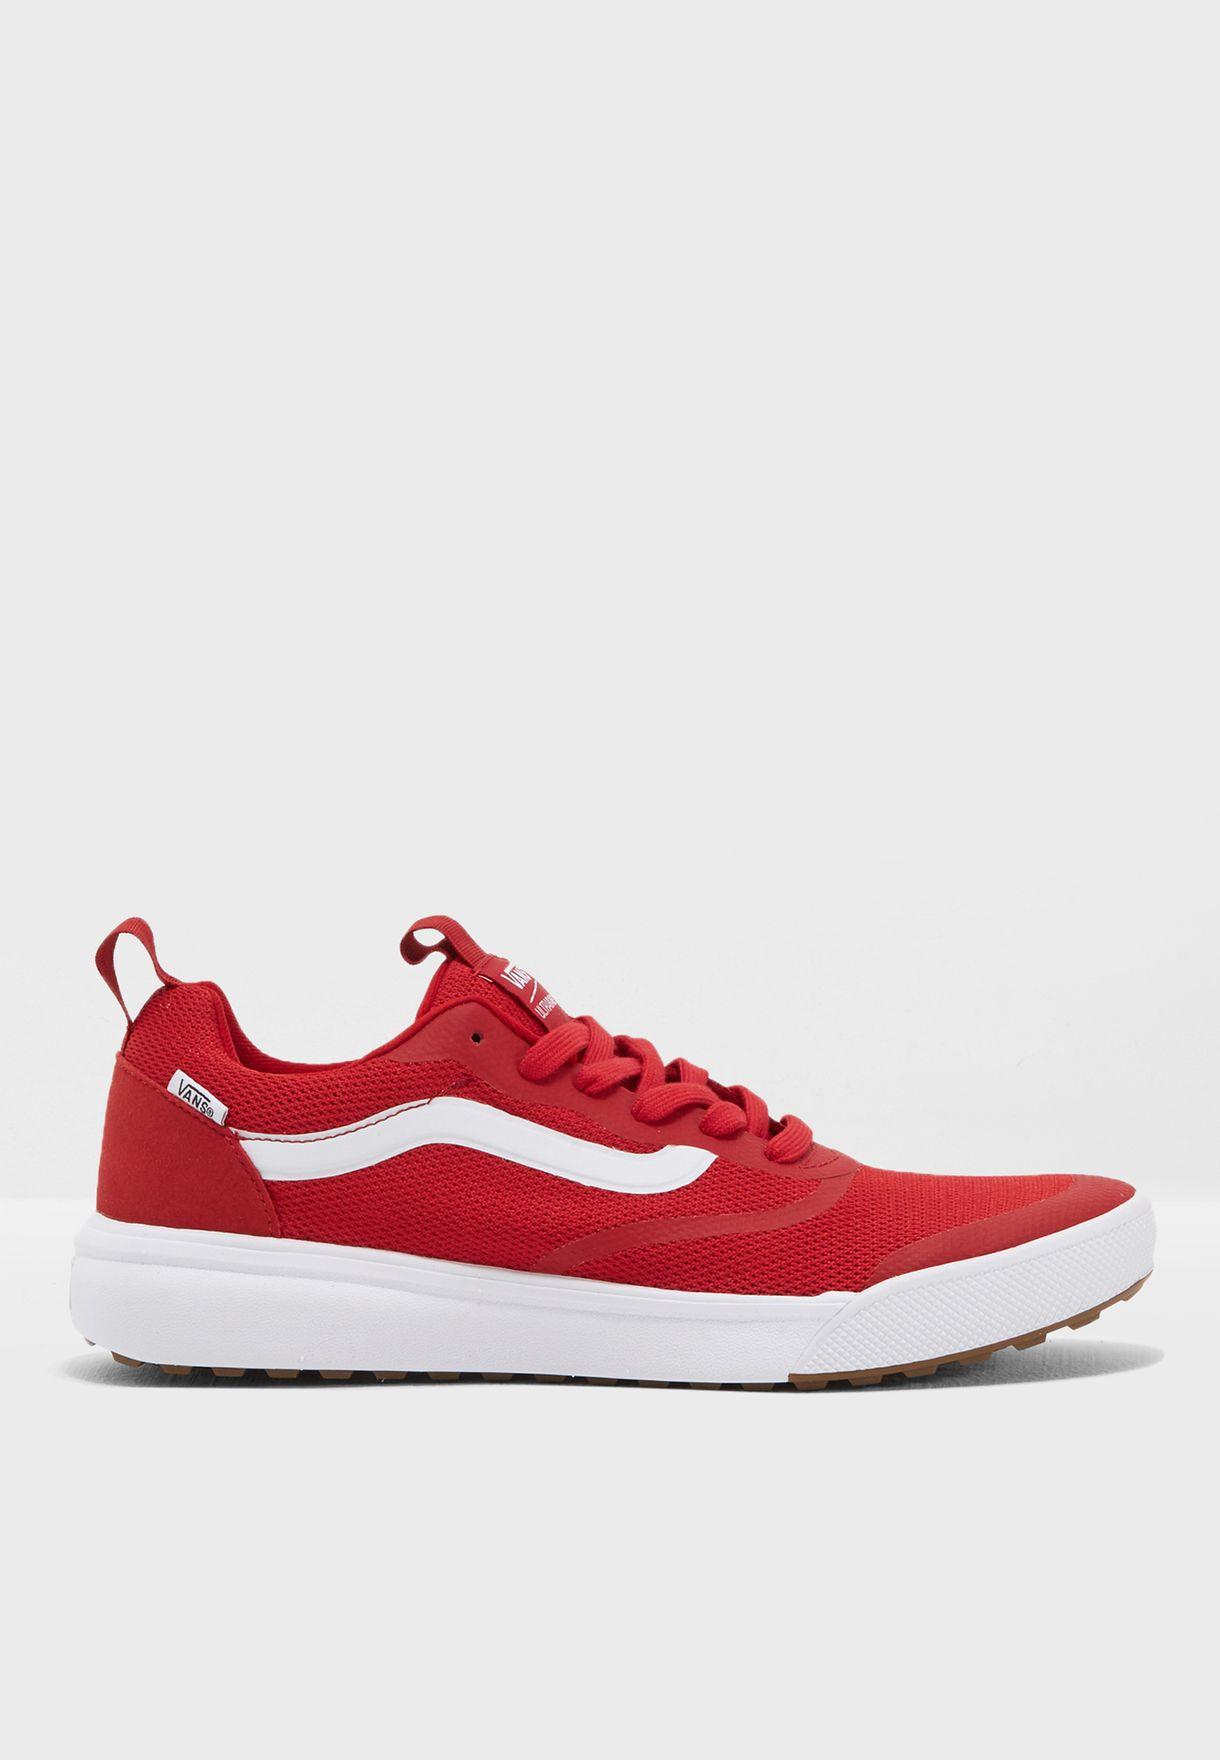 b44e7d09cc4 Shop Vans red Ultra Range Rapidweld Sneakers MVU14A for Men in UAE ...